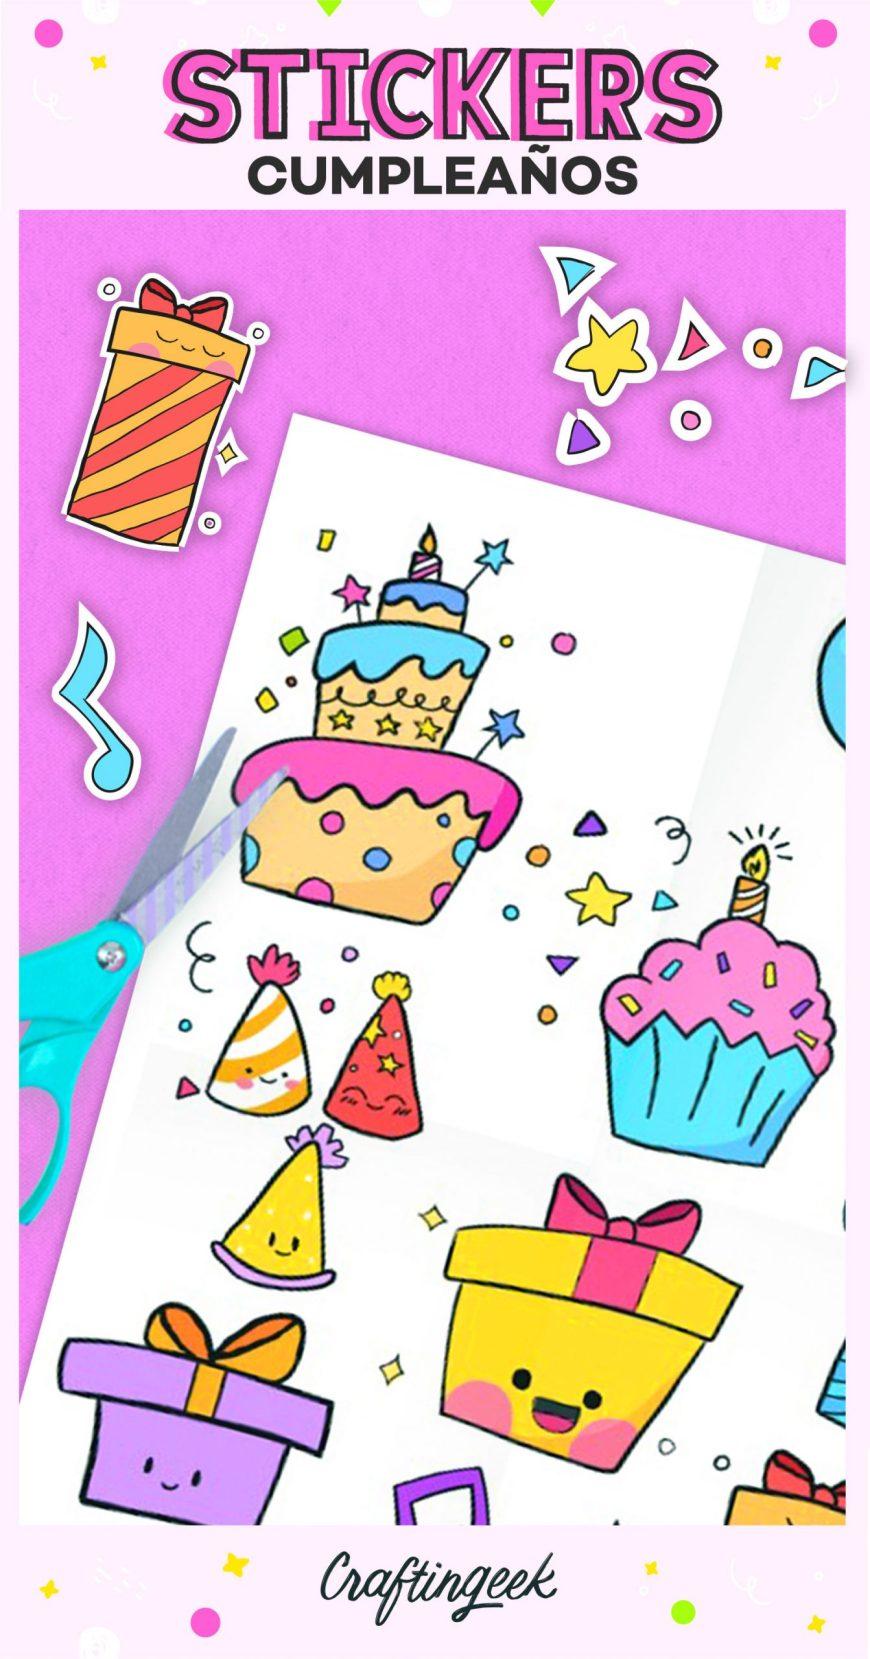 Stickers de cumpleaños